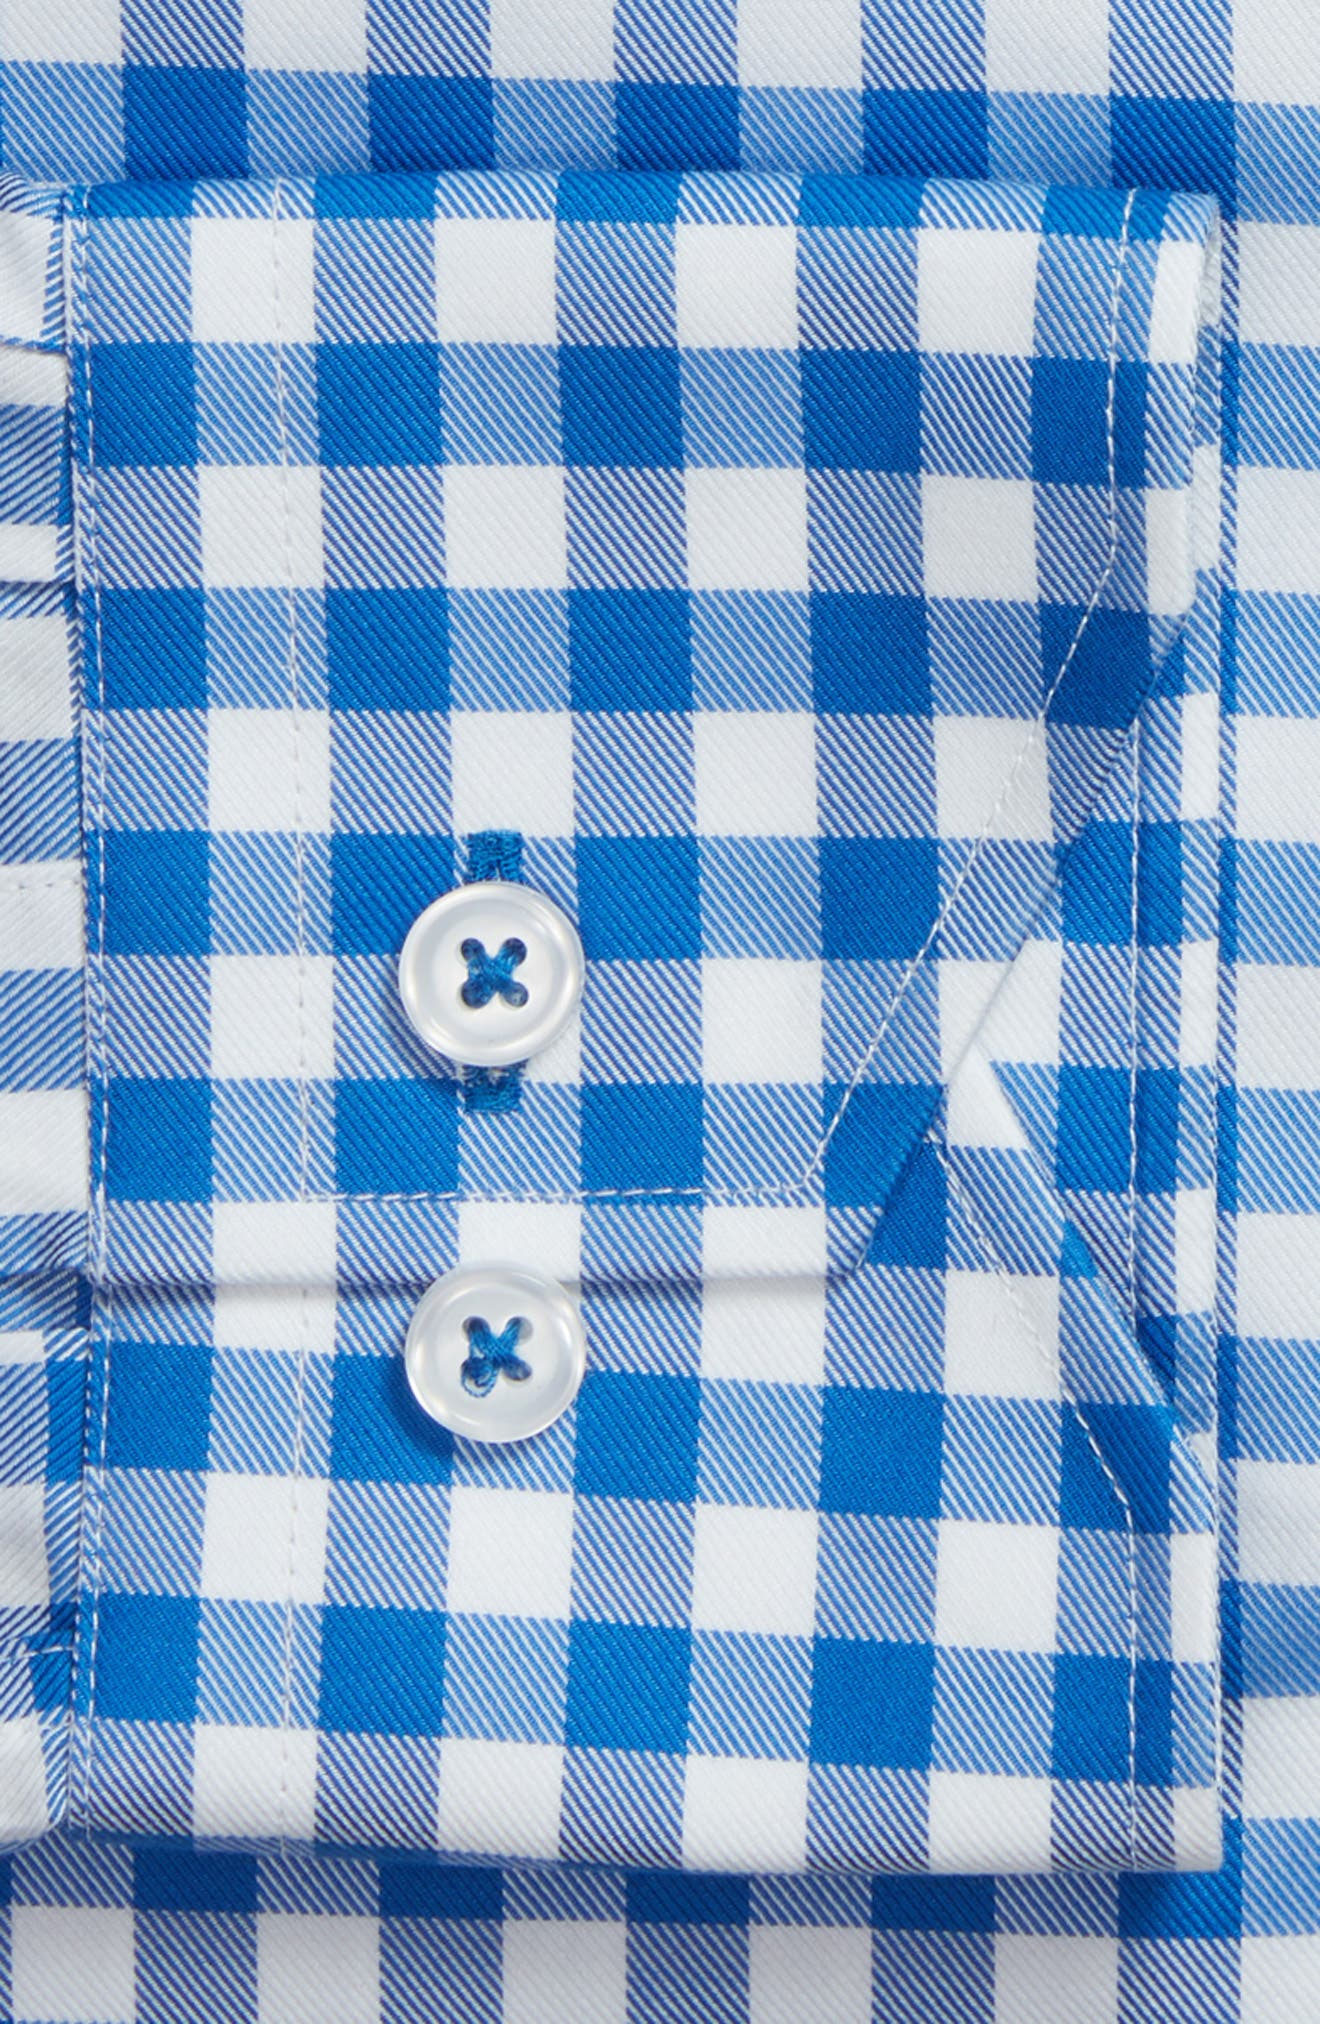 Trim Fit Gingham Dress Shirt,                             Alternate thumbnail 6, color,                             BLUE